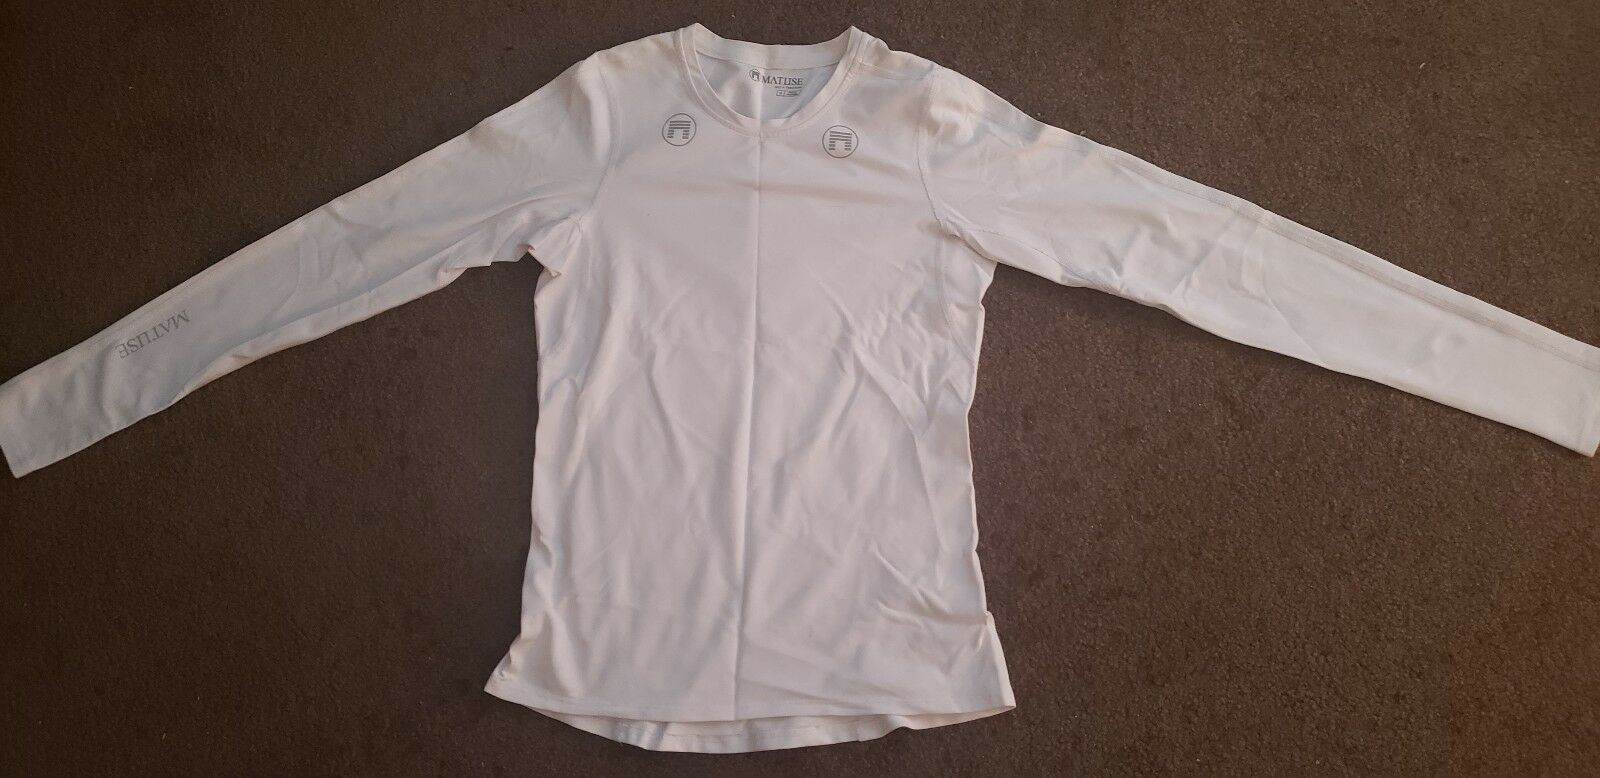 Matuse Delphin Long Sleeve Shirt Small